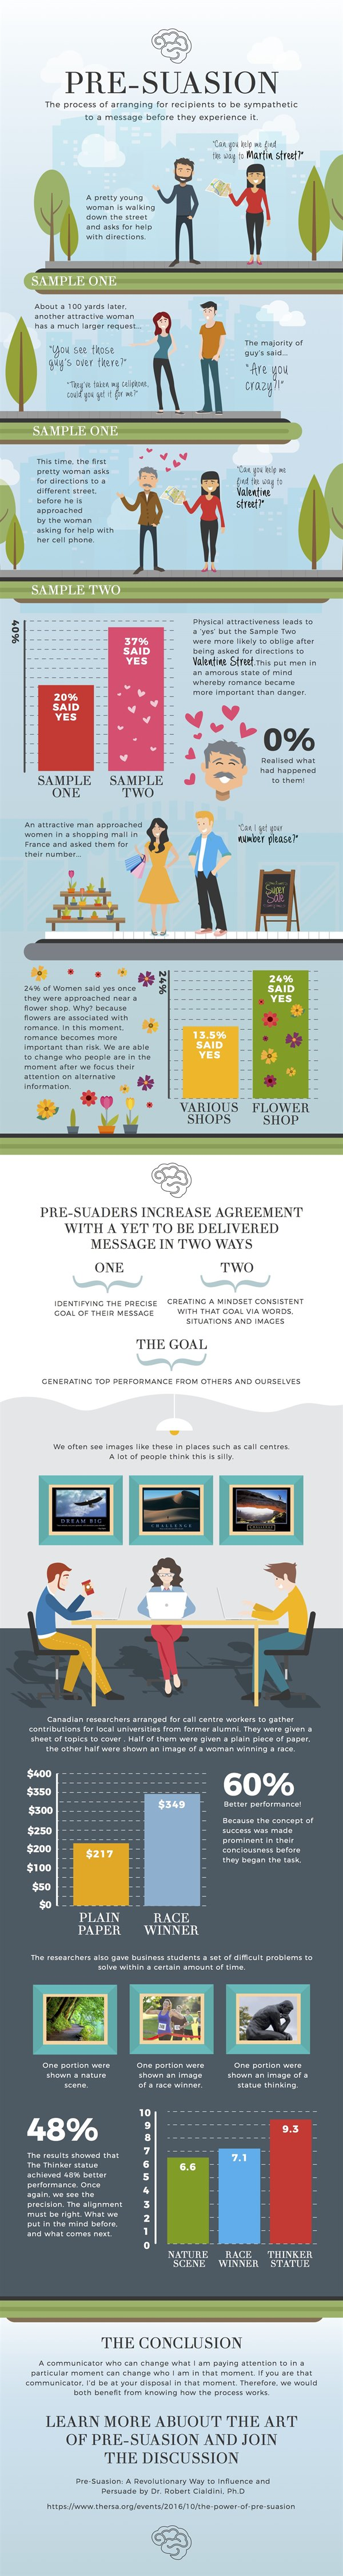 Infographic: Pre-Suasion